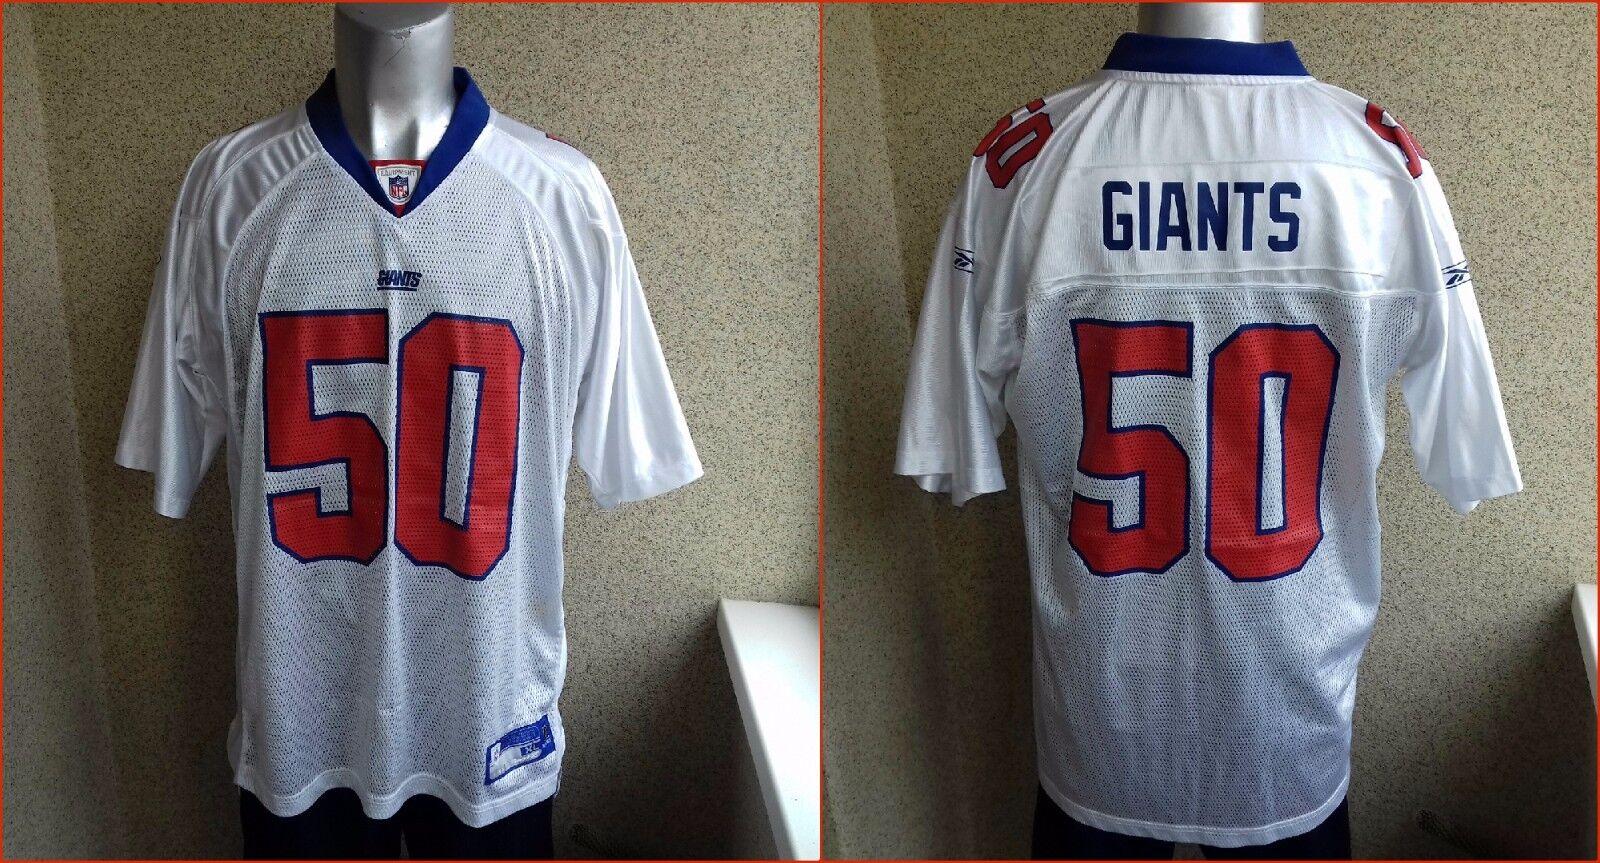 NFL New York Giants USA JERSEY XL SHIRT Authentic American Football